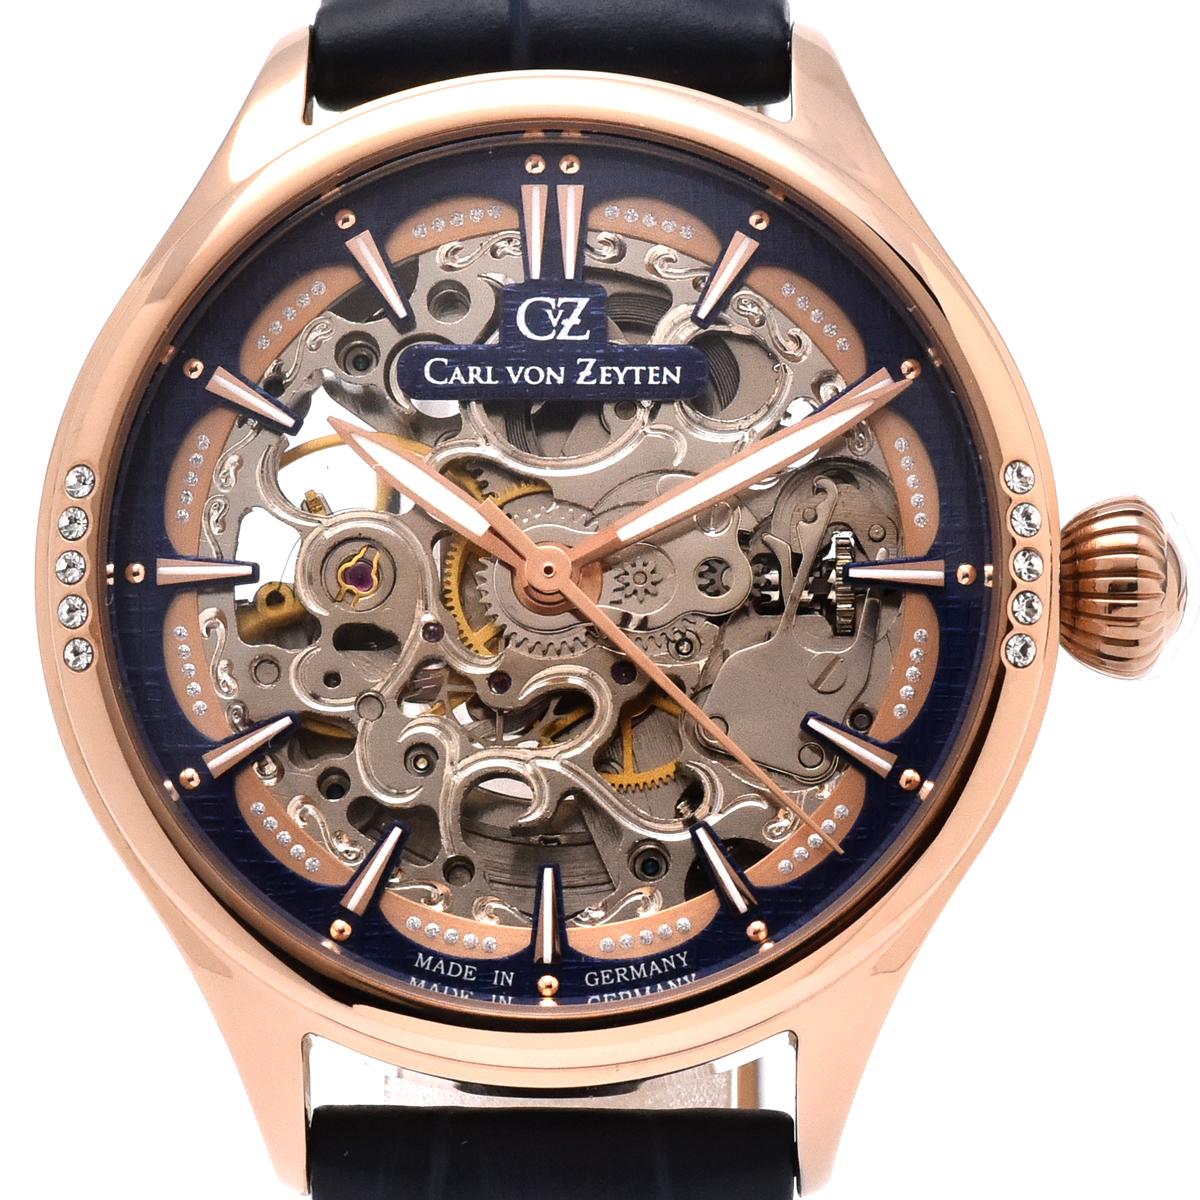 Carl von Zeyten カール・フォン・ツォイテン 自動巻き(手巻き機能あり) 腕時計 [CvZ0057RBL] 正規代理店品 スケルトン